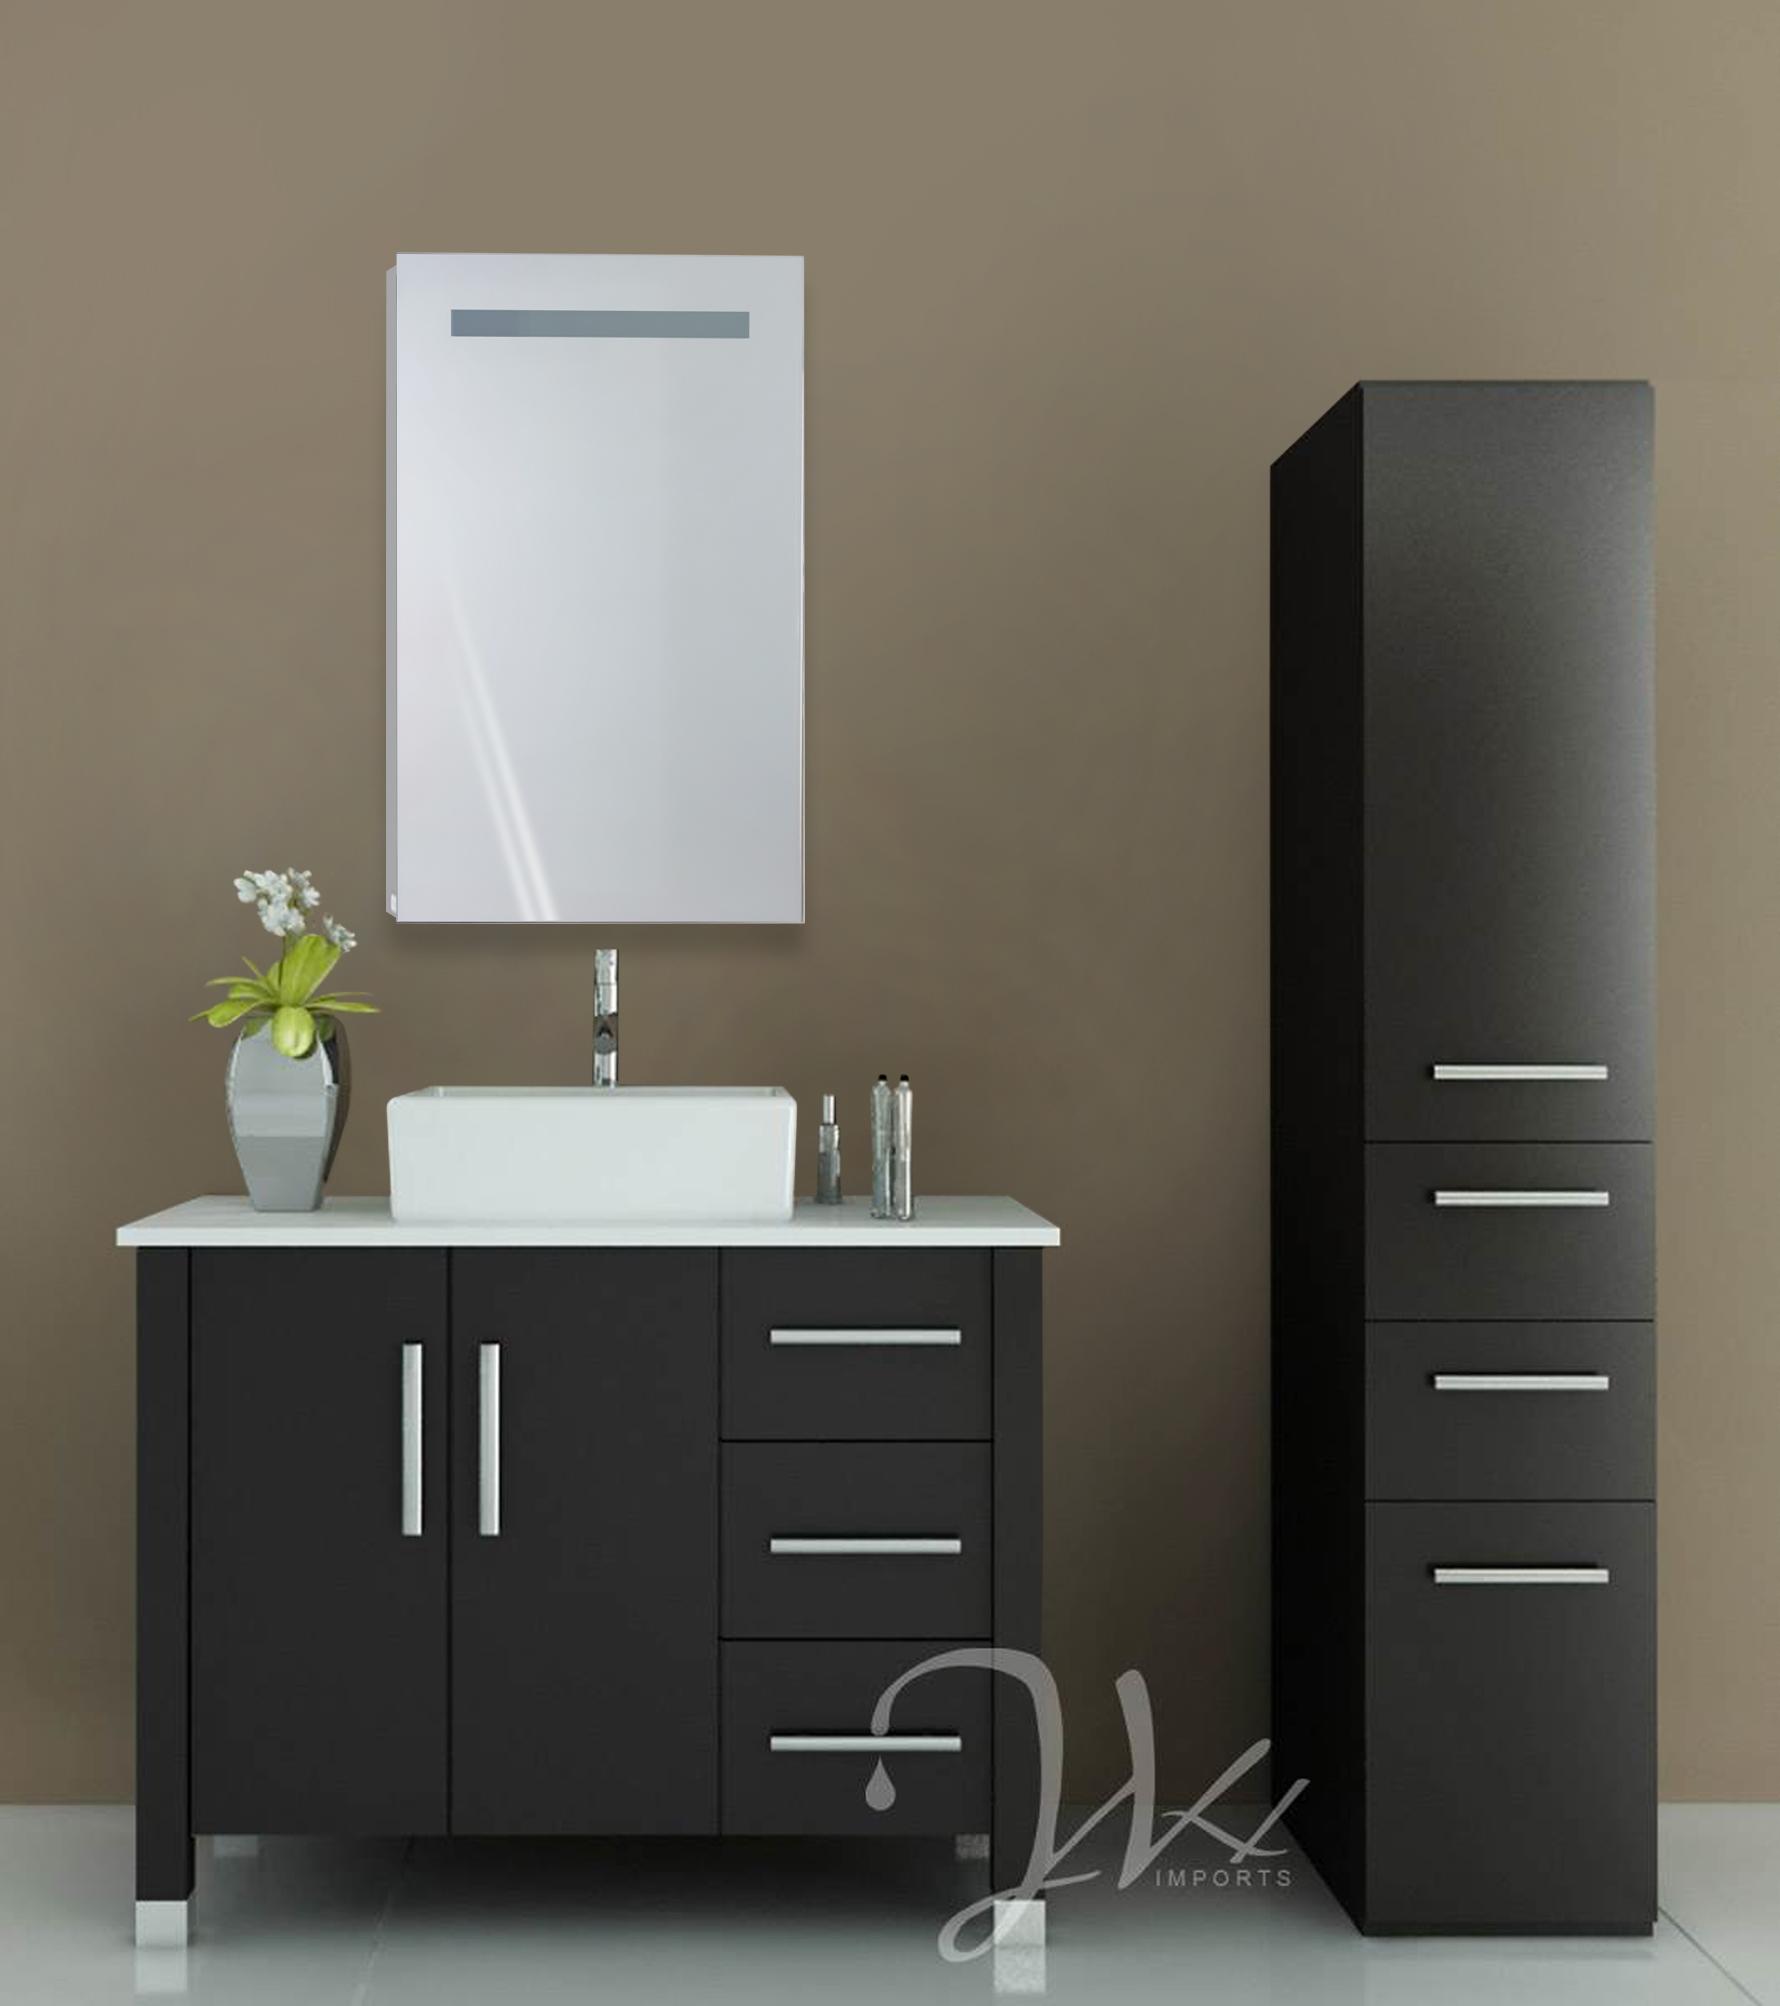 Sliding mirror cabinet bathroom